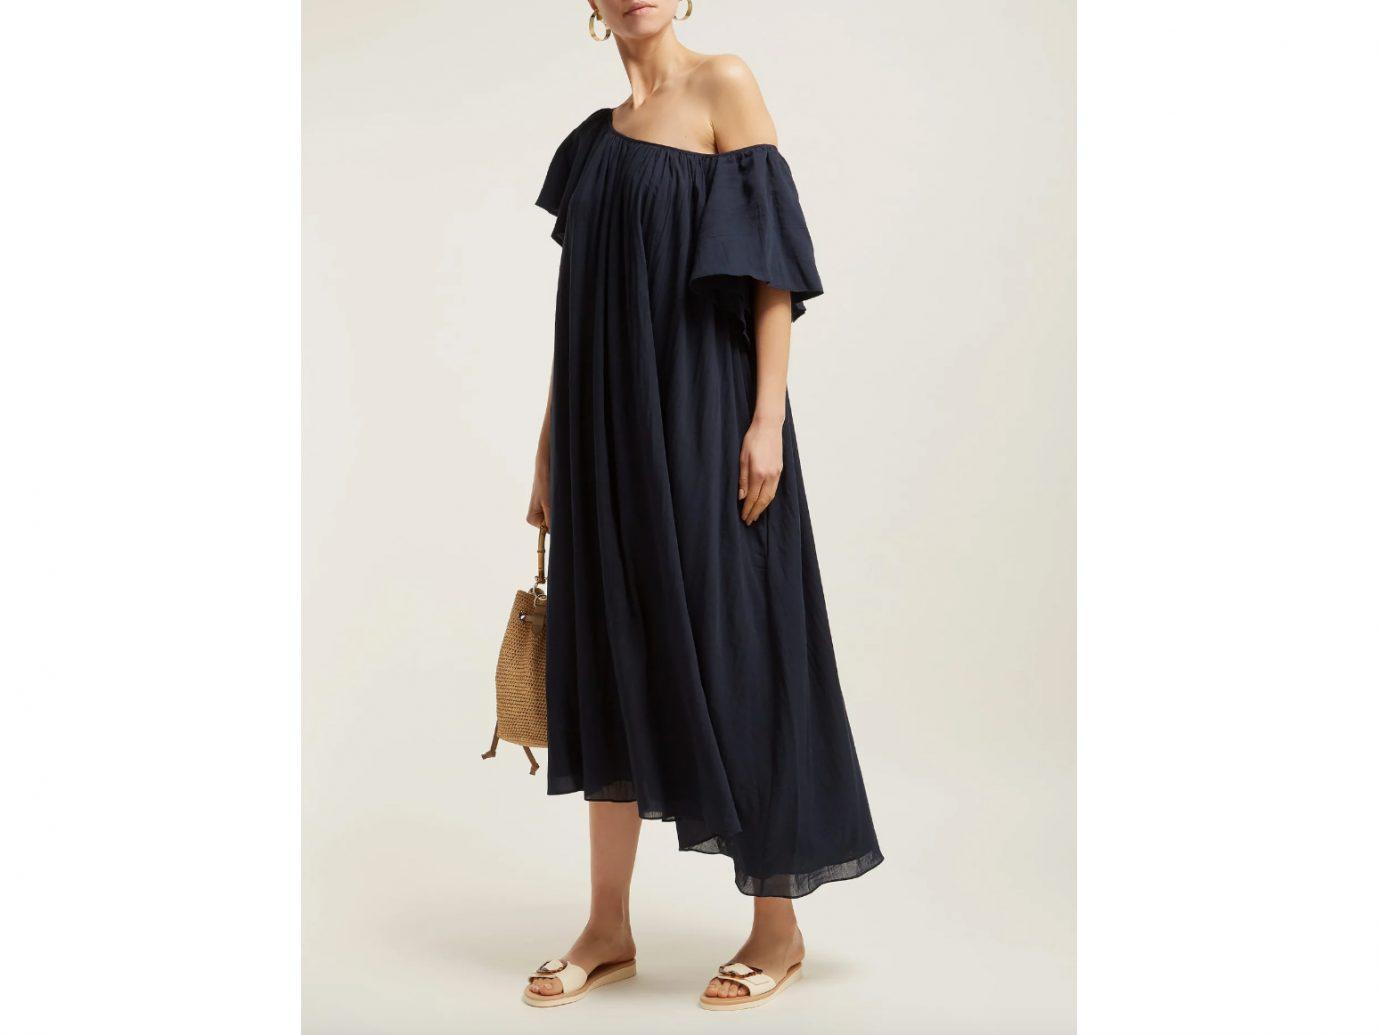 Loup Charmant Hydrus off-the-shoulder cotton dress